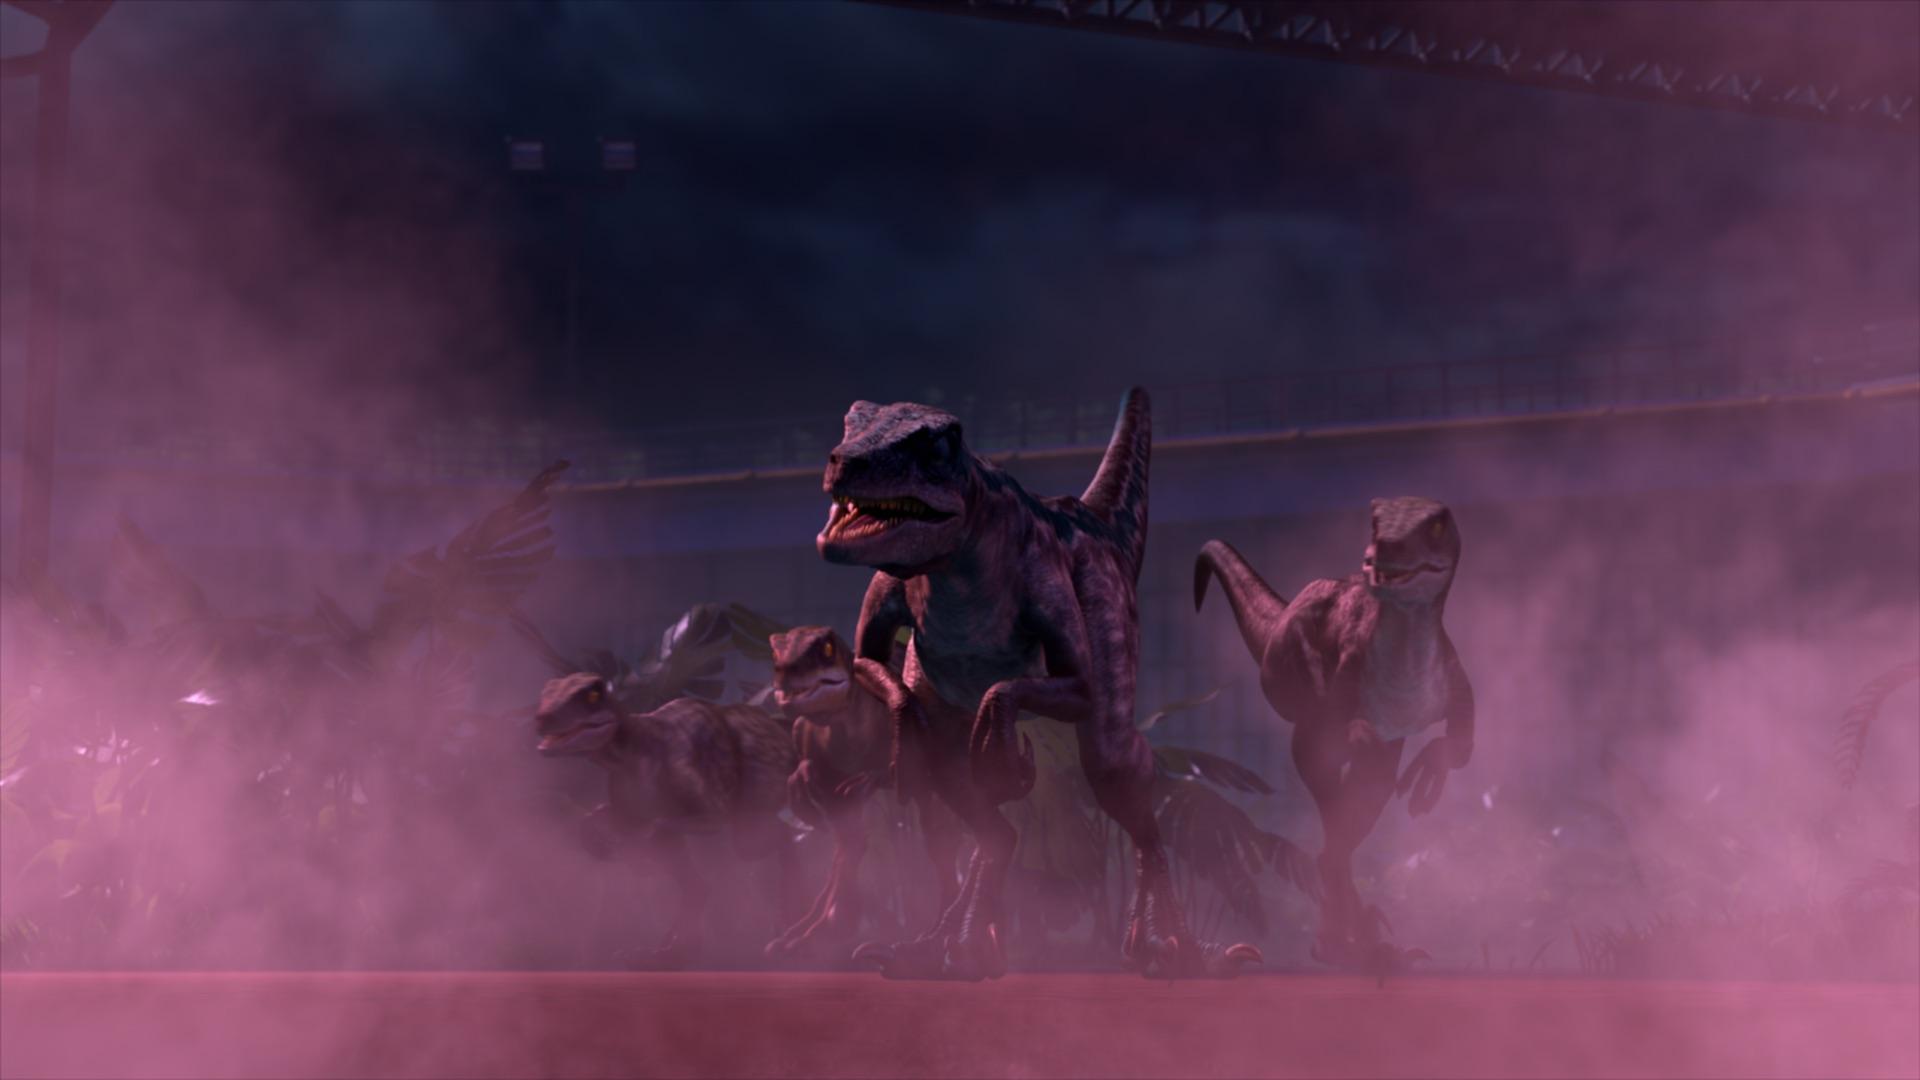 Jurassic World: Nuove avventure - i feroci raptor